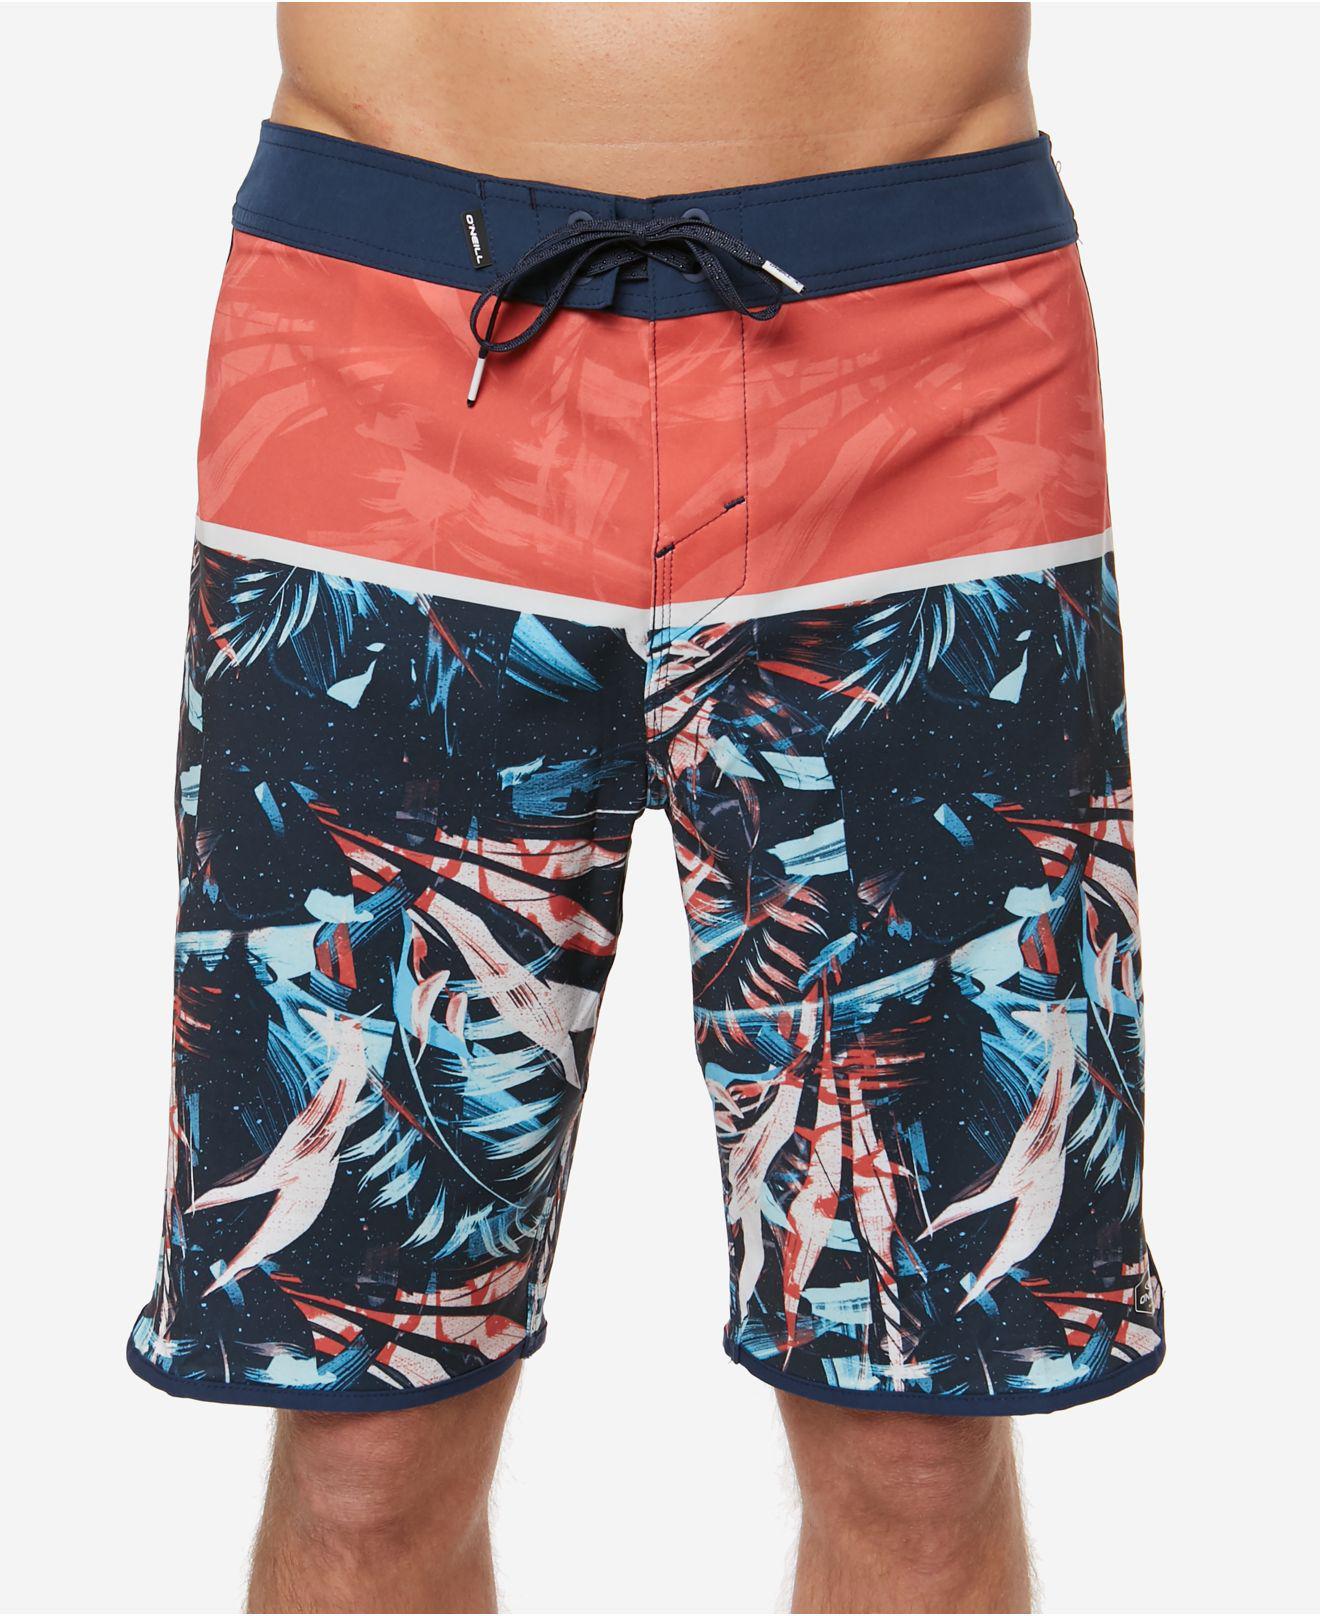 86d1155b1f O'neill Sportswear. Men's Blue Hyperfreak Ruins Colorblocked Tropical-print  20